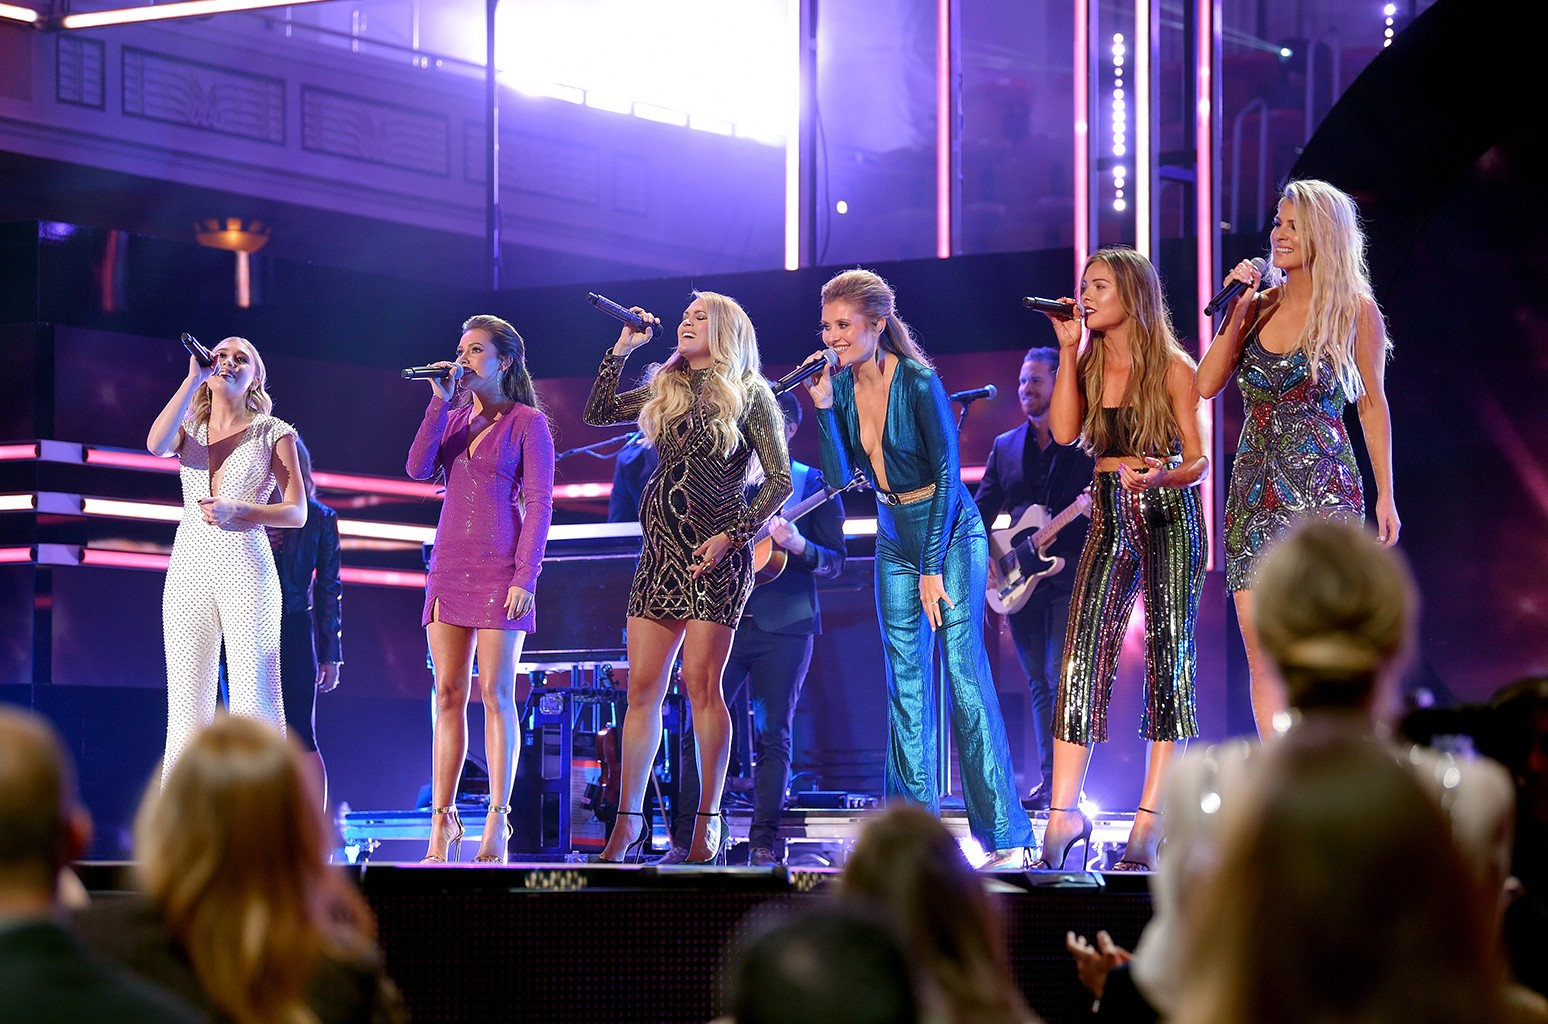 Maddie and Tae, Carrie Underwood, Hannah Mulholland, Naomi Cooke and Jennifer Wayne